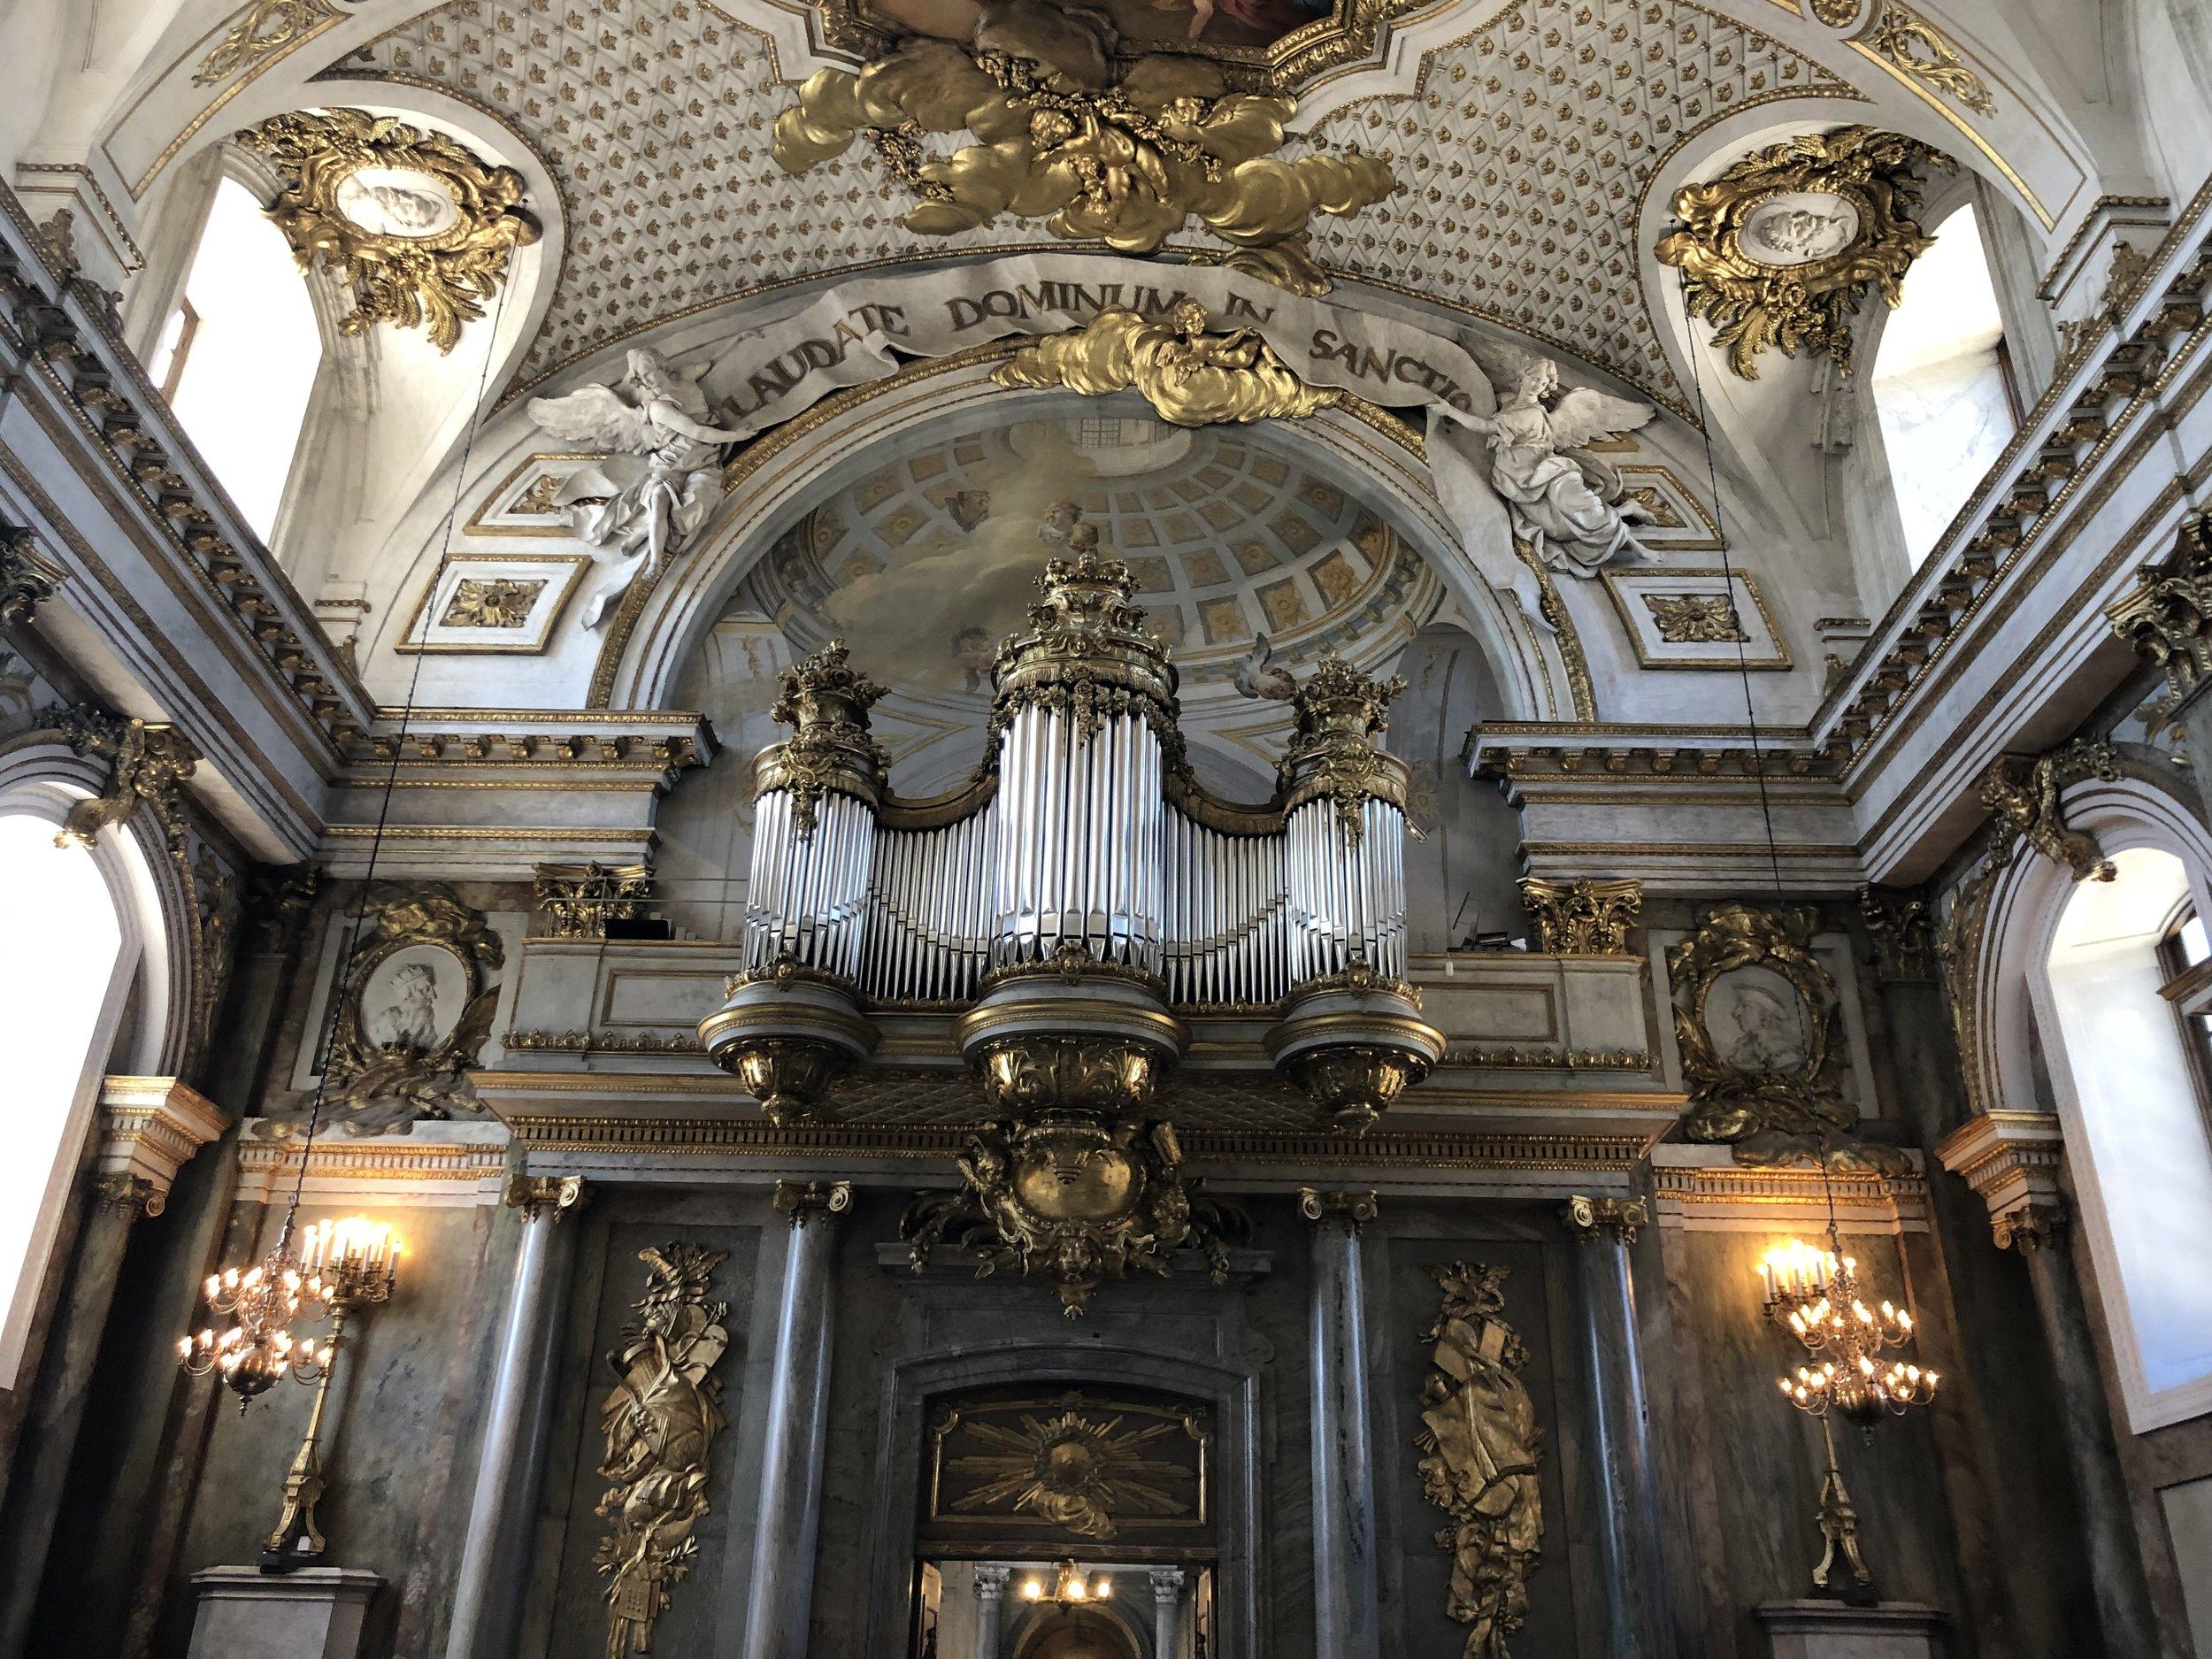 Beautiful hanging pipe organ in the church.